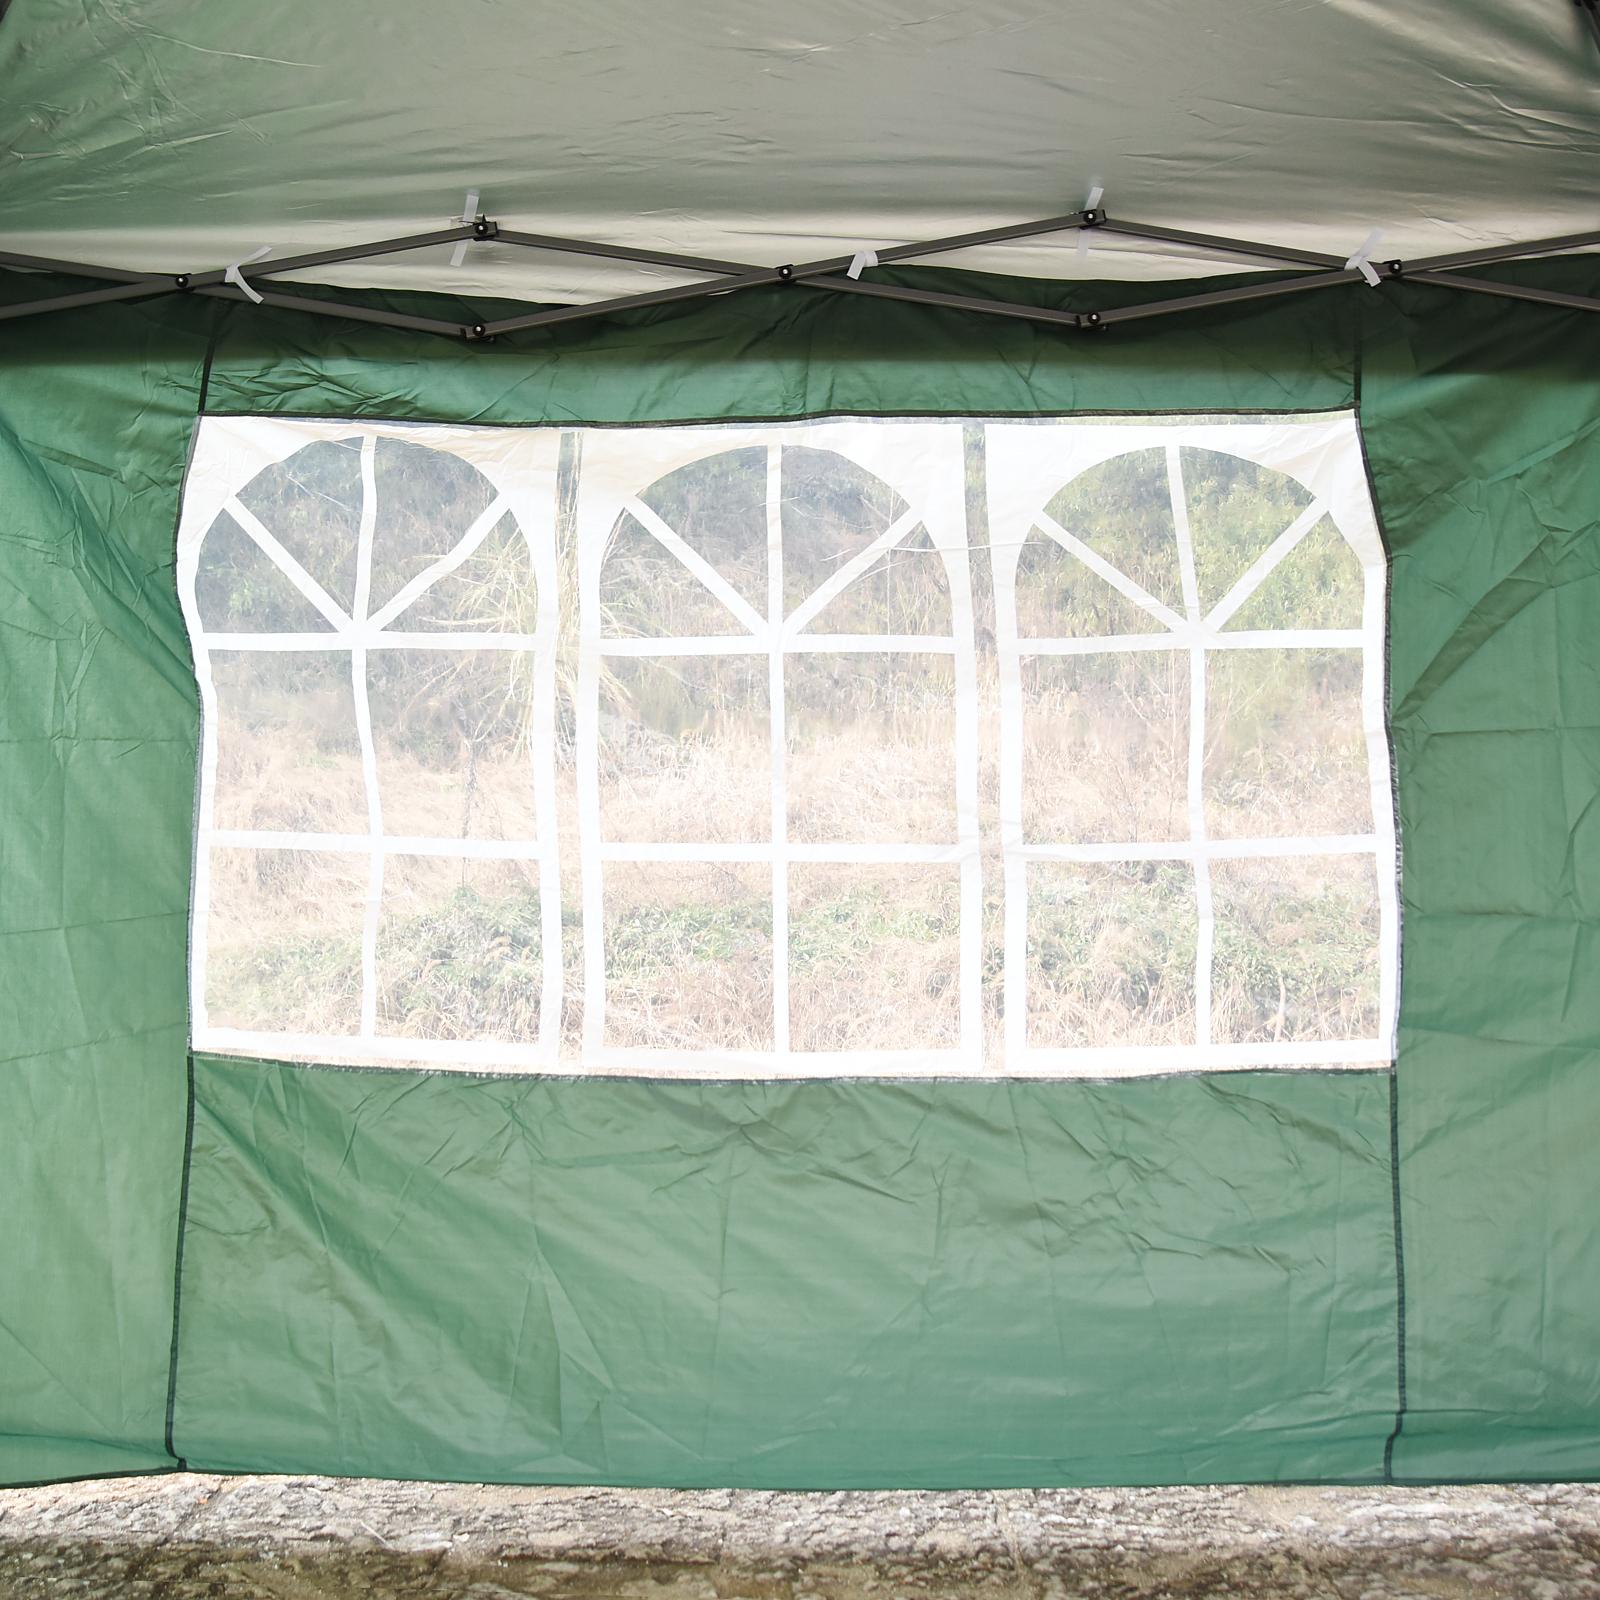 Outdoor-10-039-x20-039-EZ-POP-UP-Gazebo-Wedding-Party-Tent-Canopy-Folding-w-Carry-Bag thumbnail 30